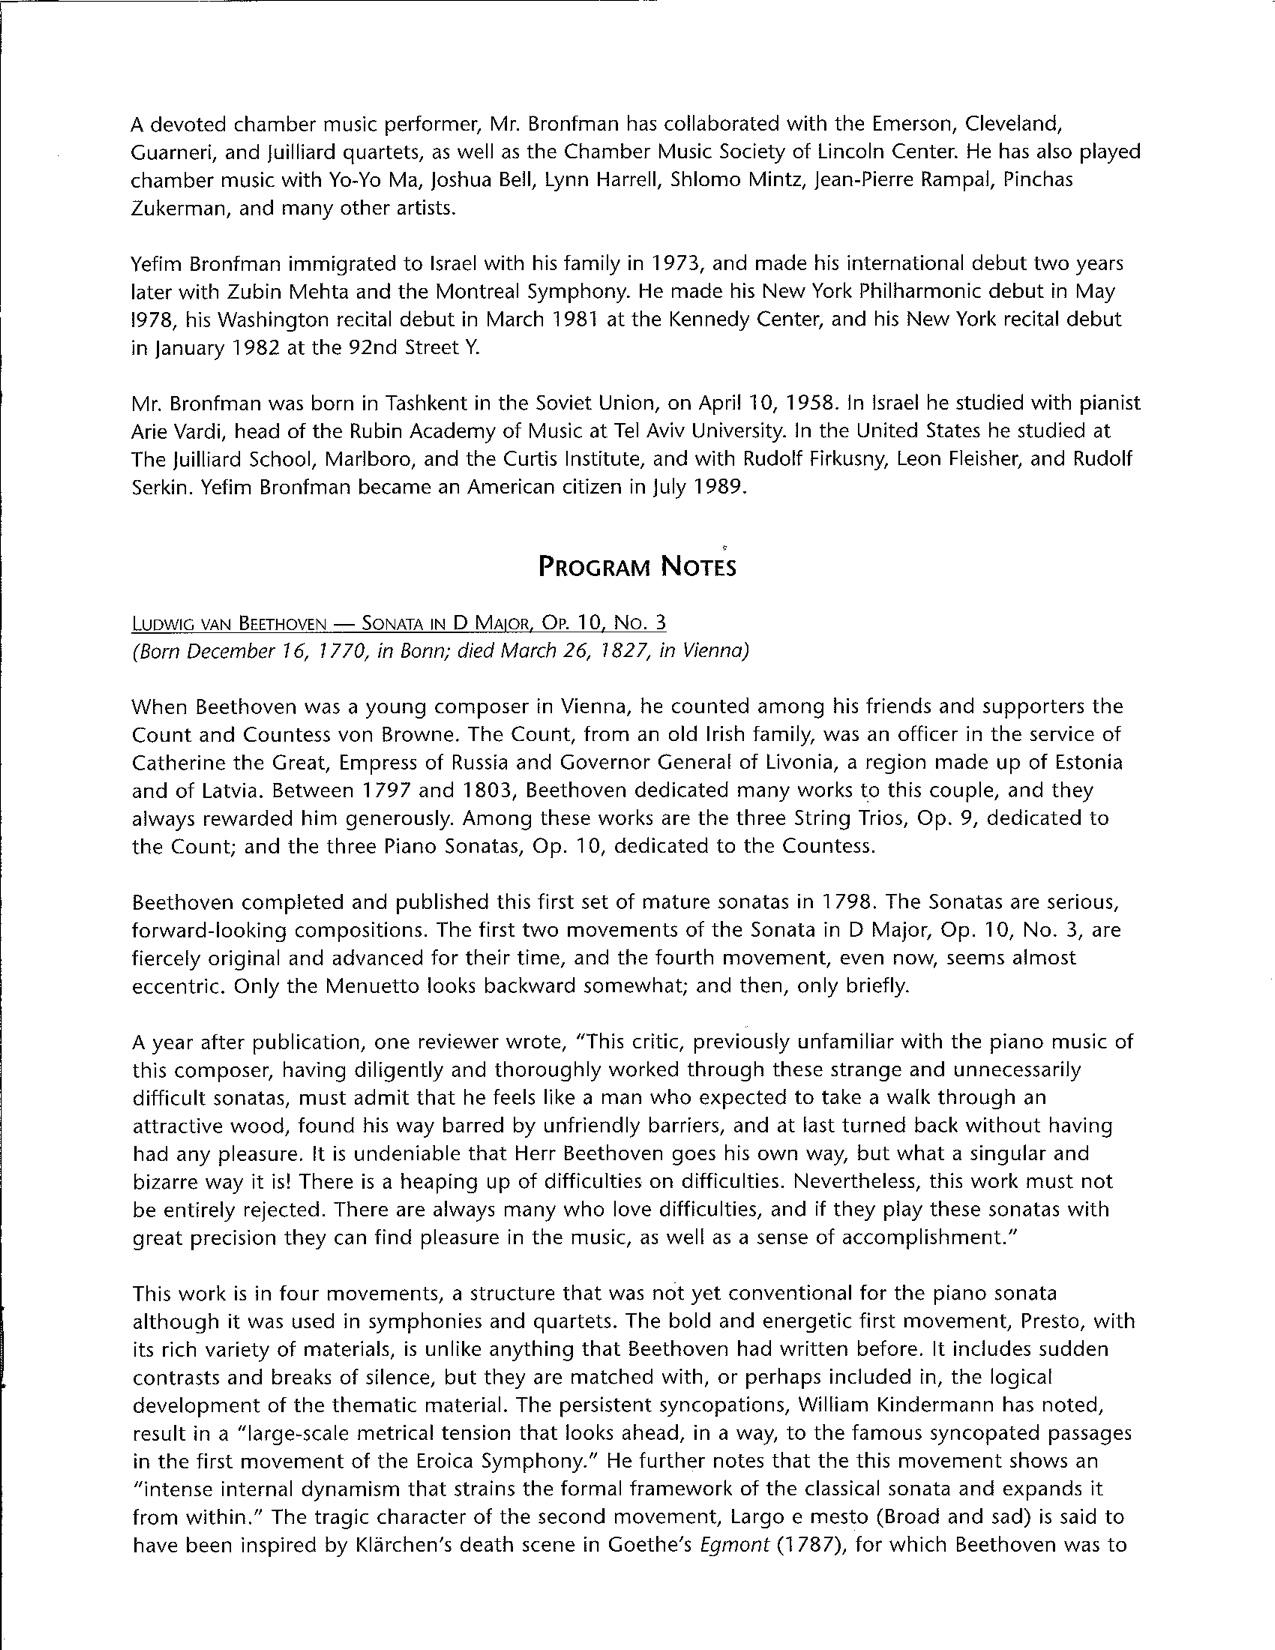 Bronfman02-03_Program5.jpg